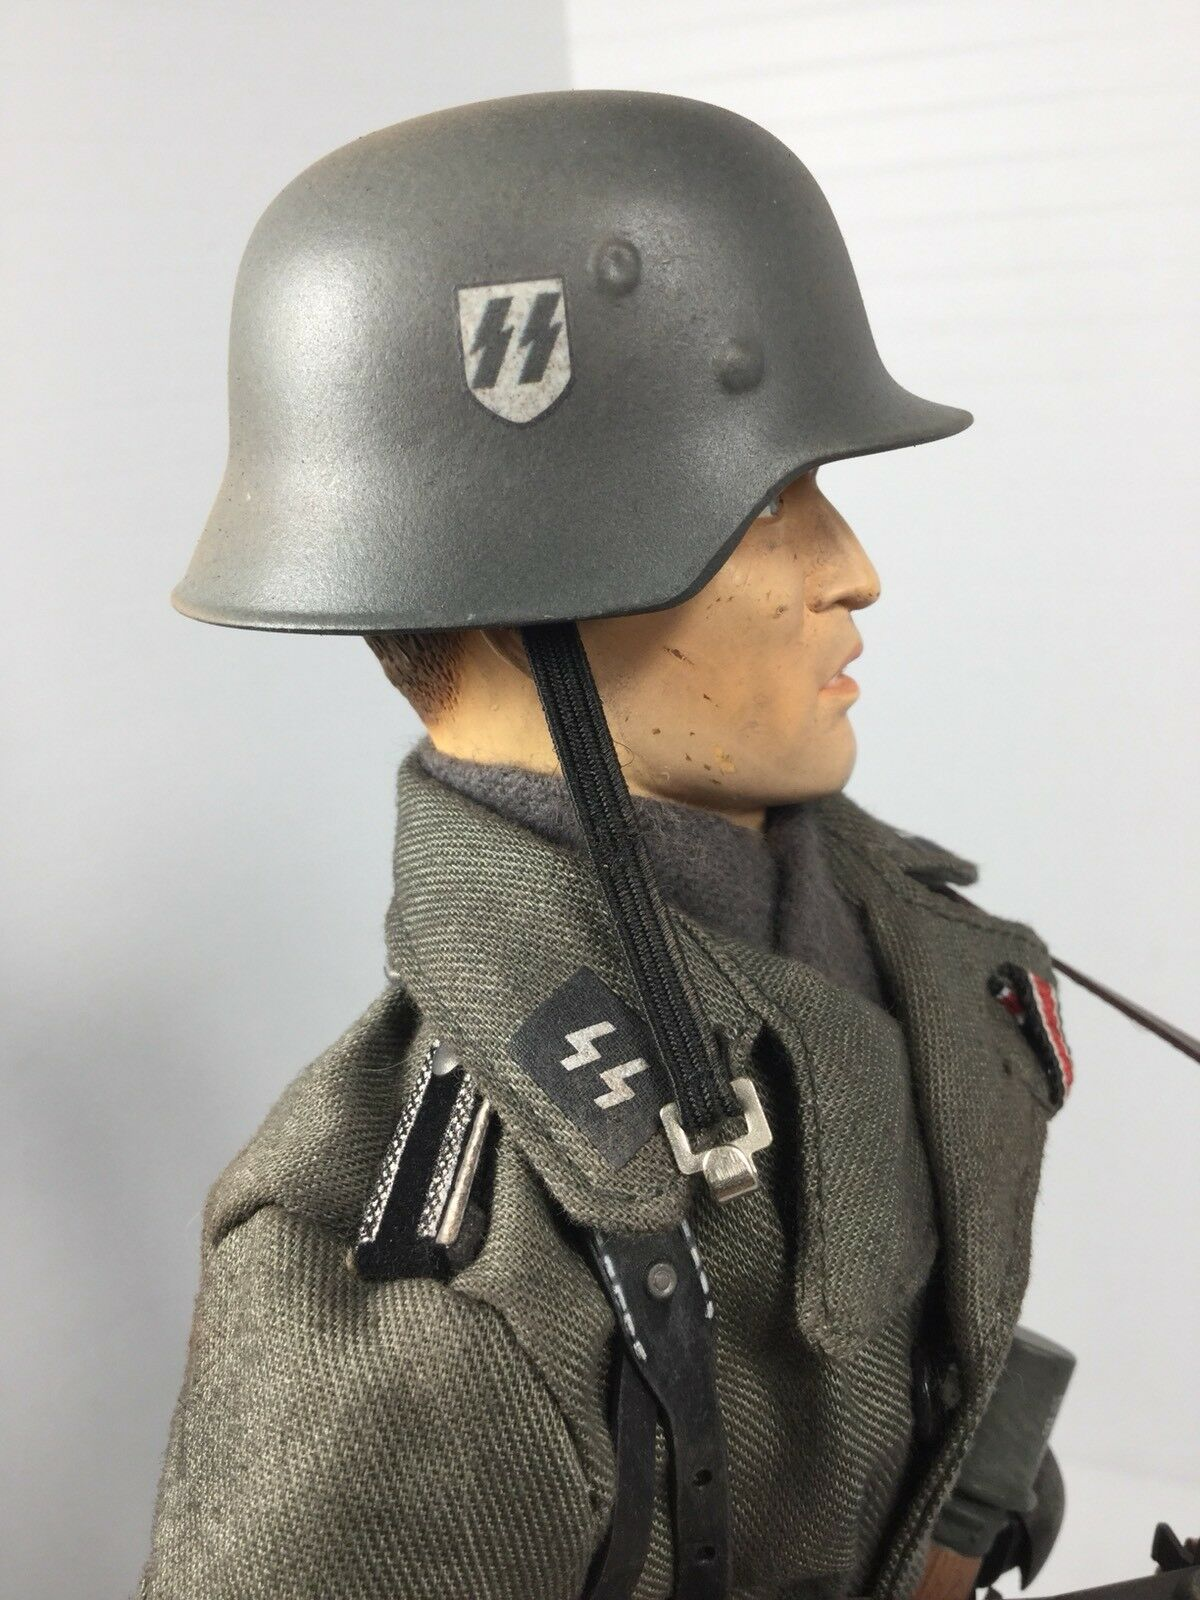 1 1 1 6 DRAGON GERMAN 27TH SS DIV MG-34 GUNNER P-38 EASTERN FRONT BBI DID 21 WW2 8967f1